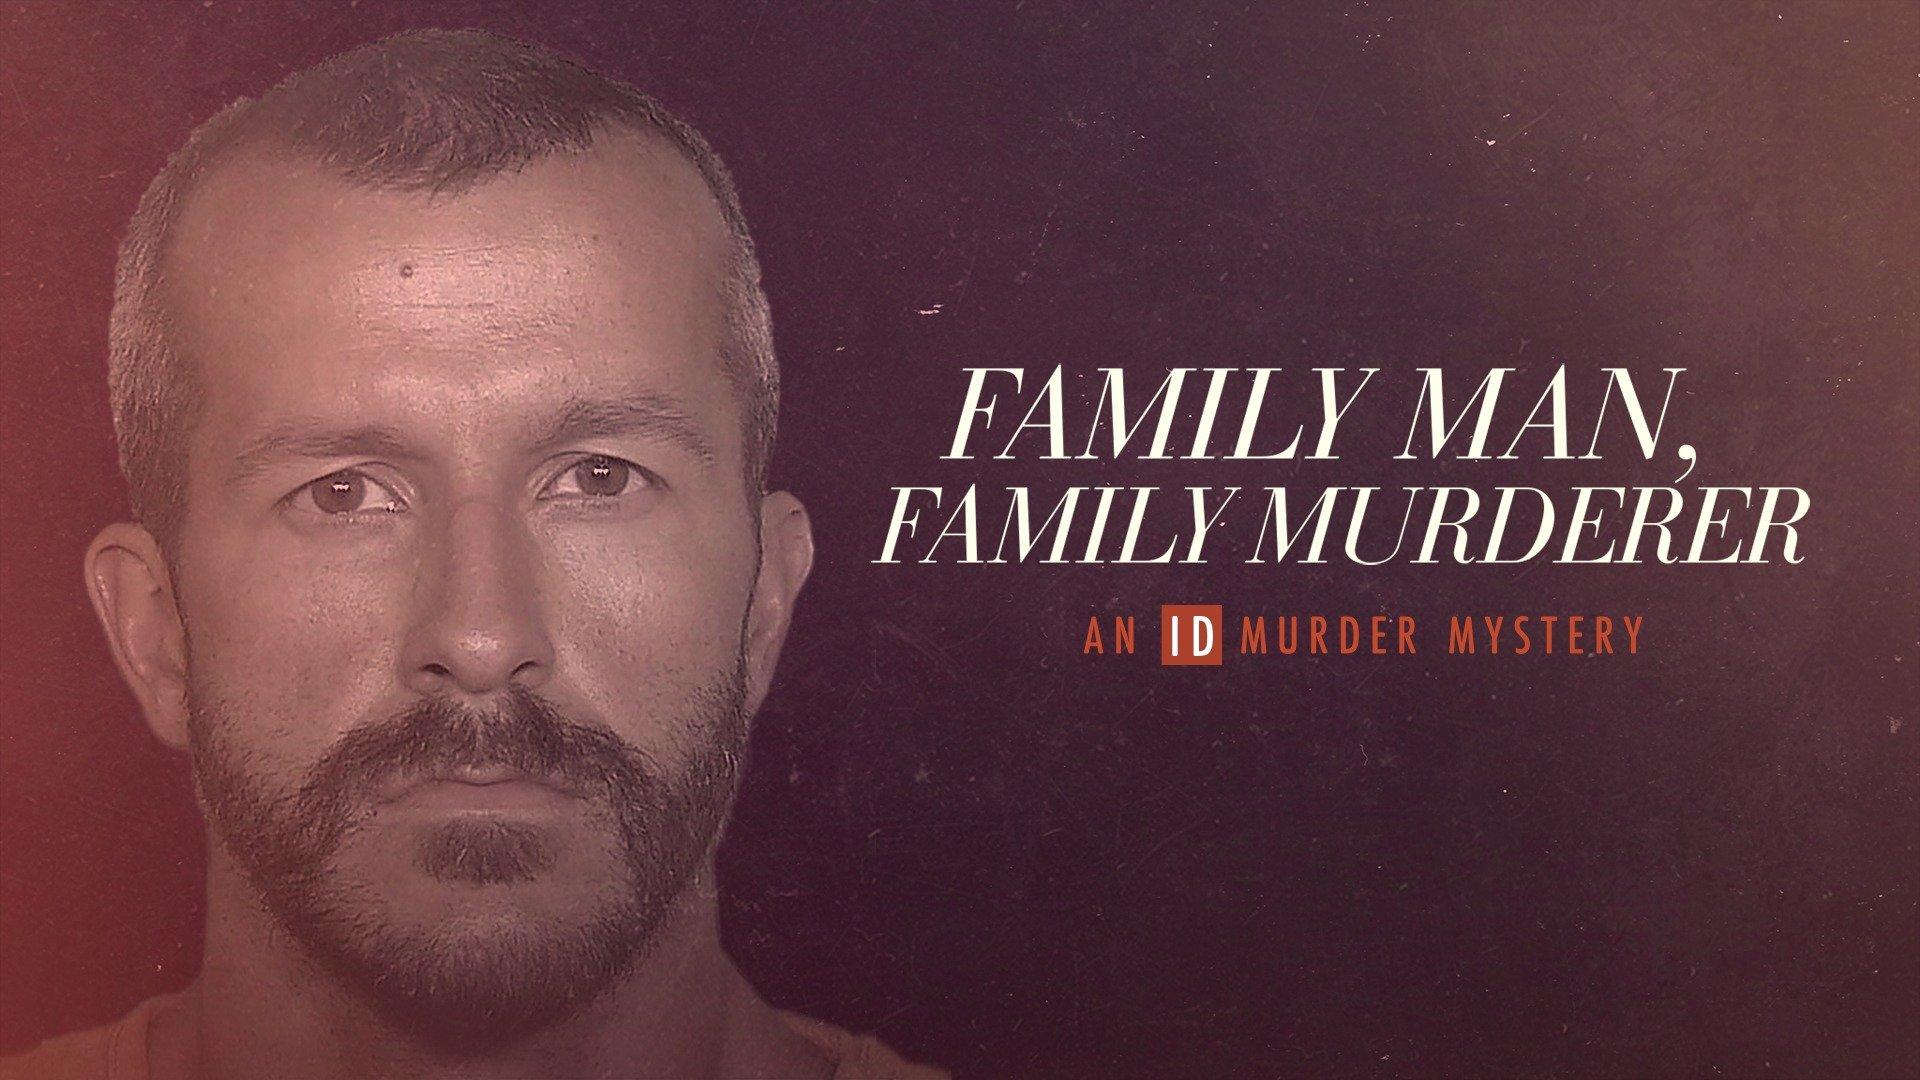 Family Man, Family Murderer: An ID Murder Mystery